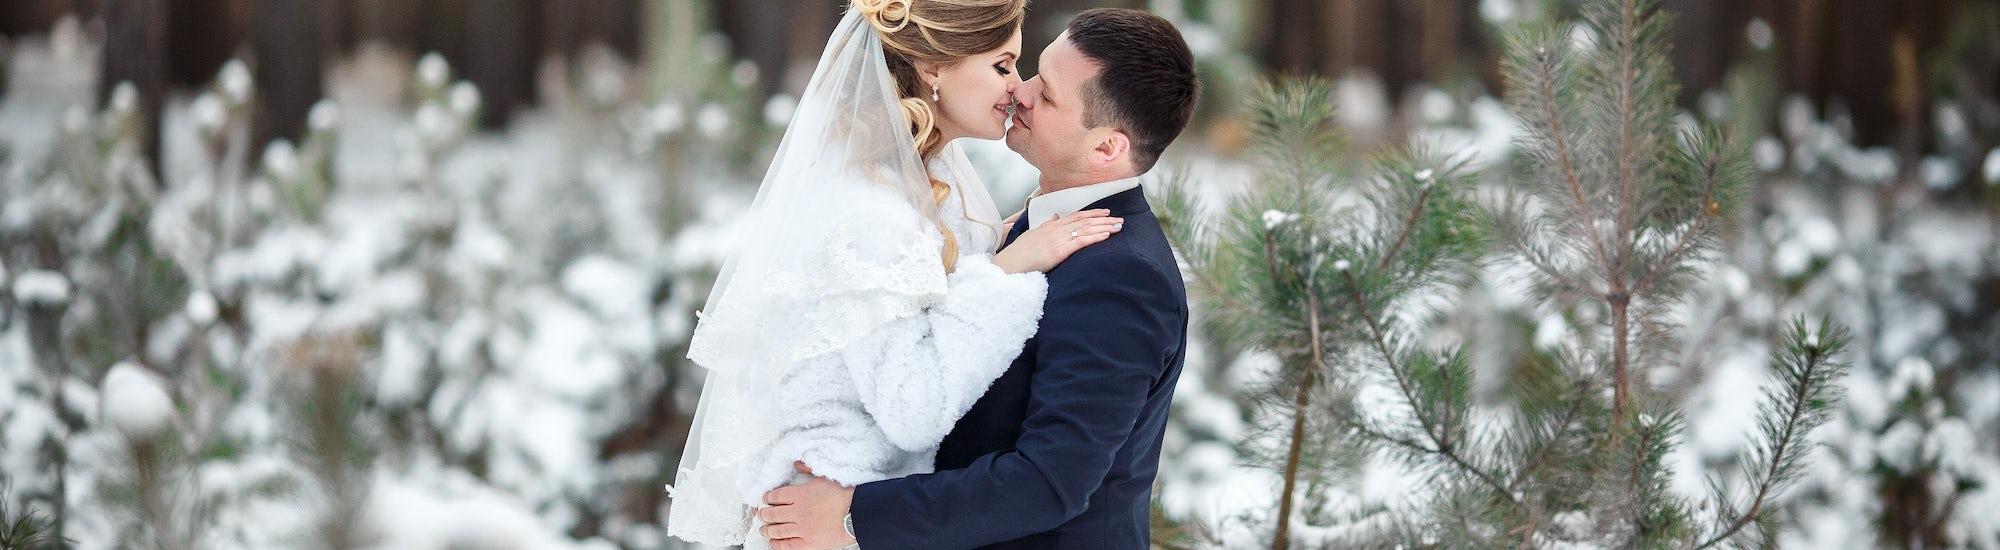 Winter Wedding Feature